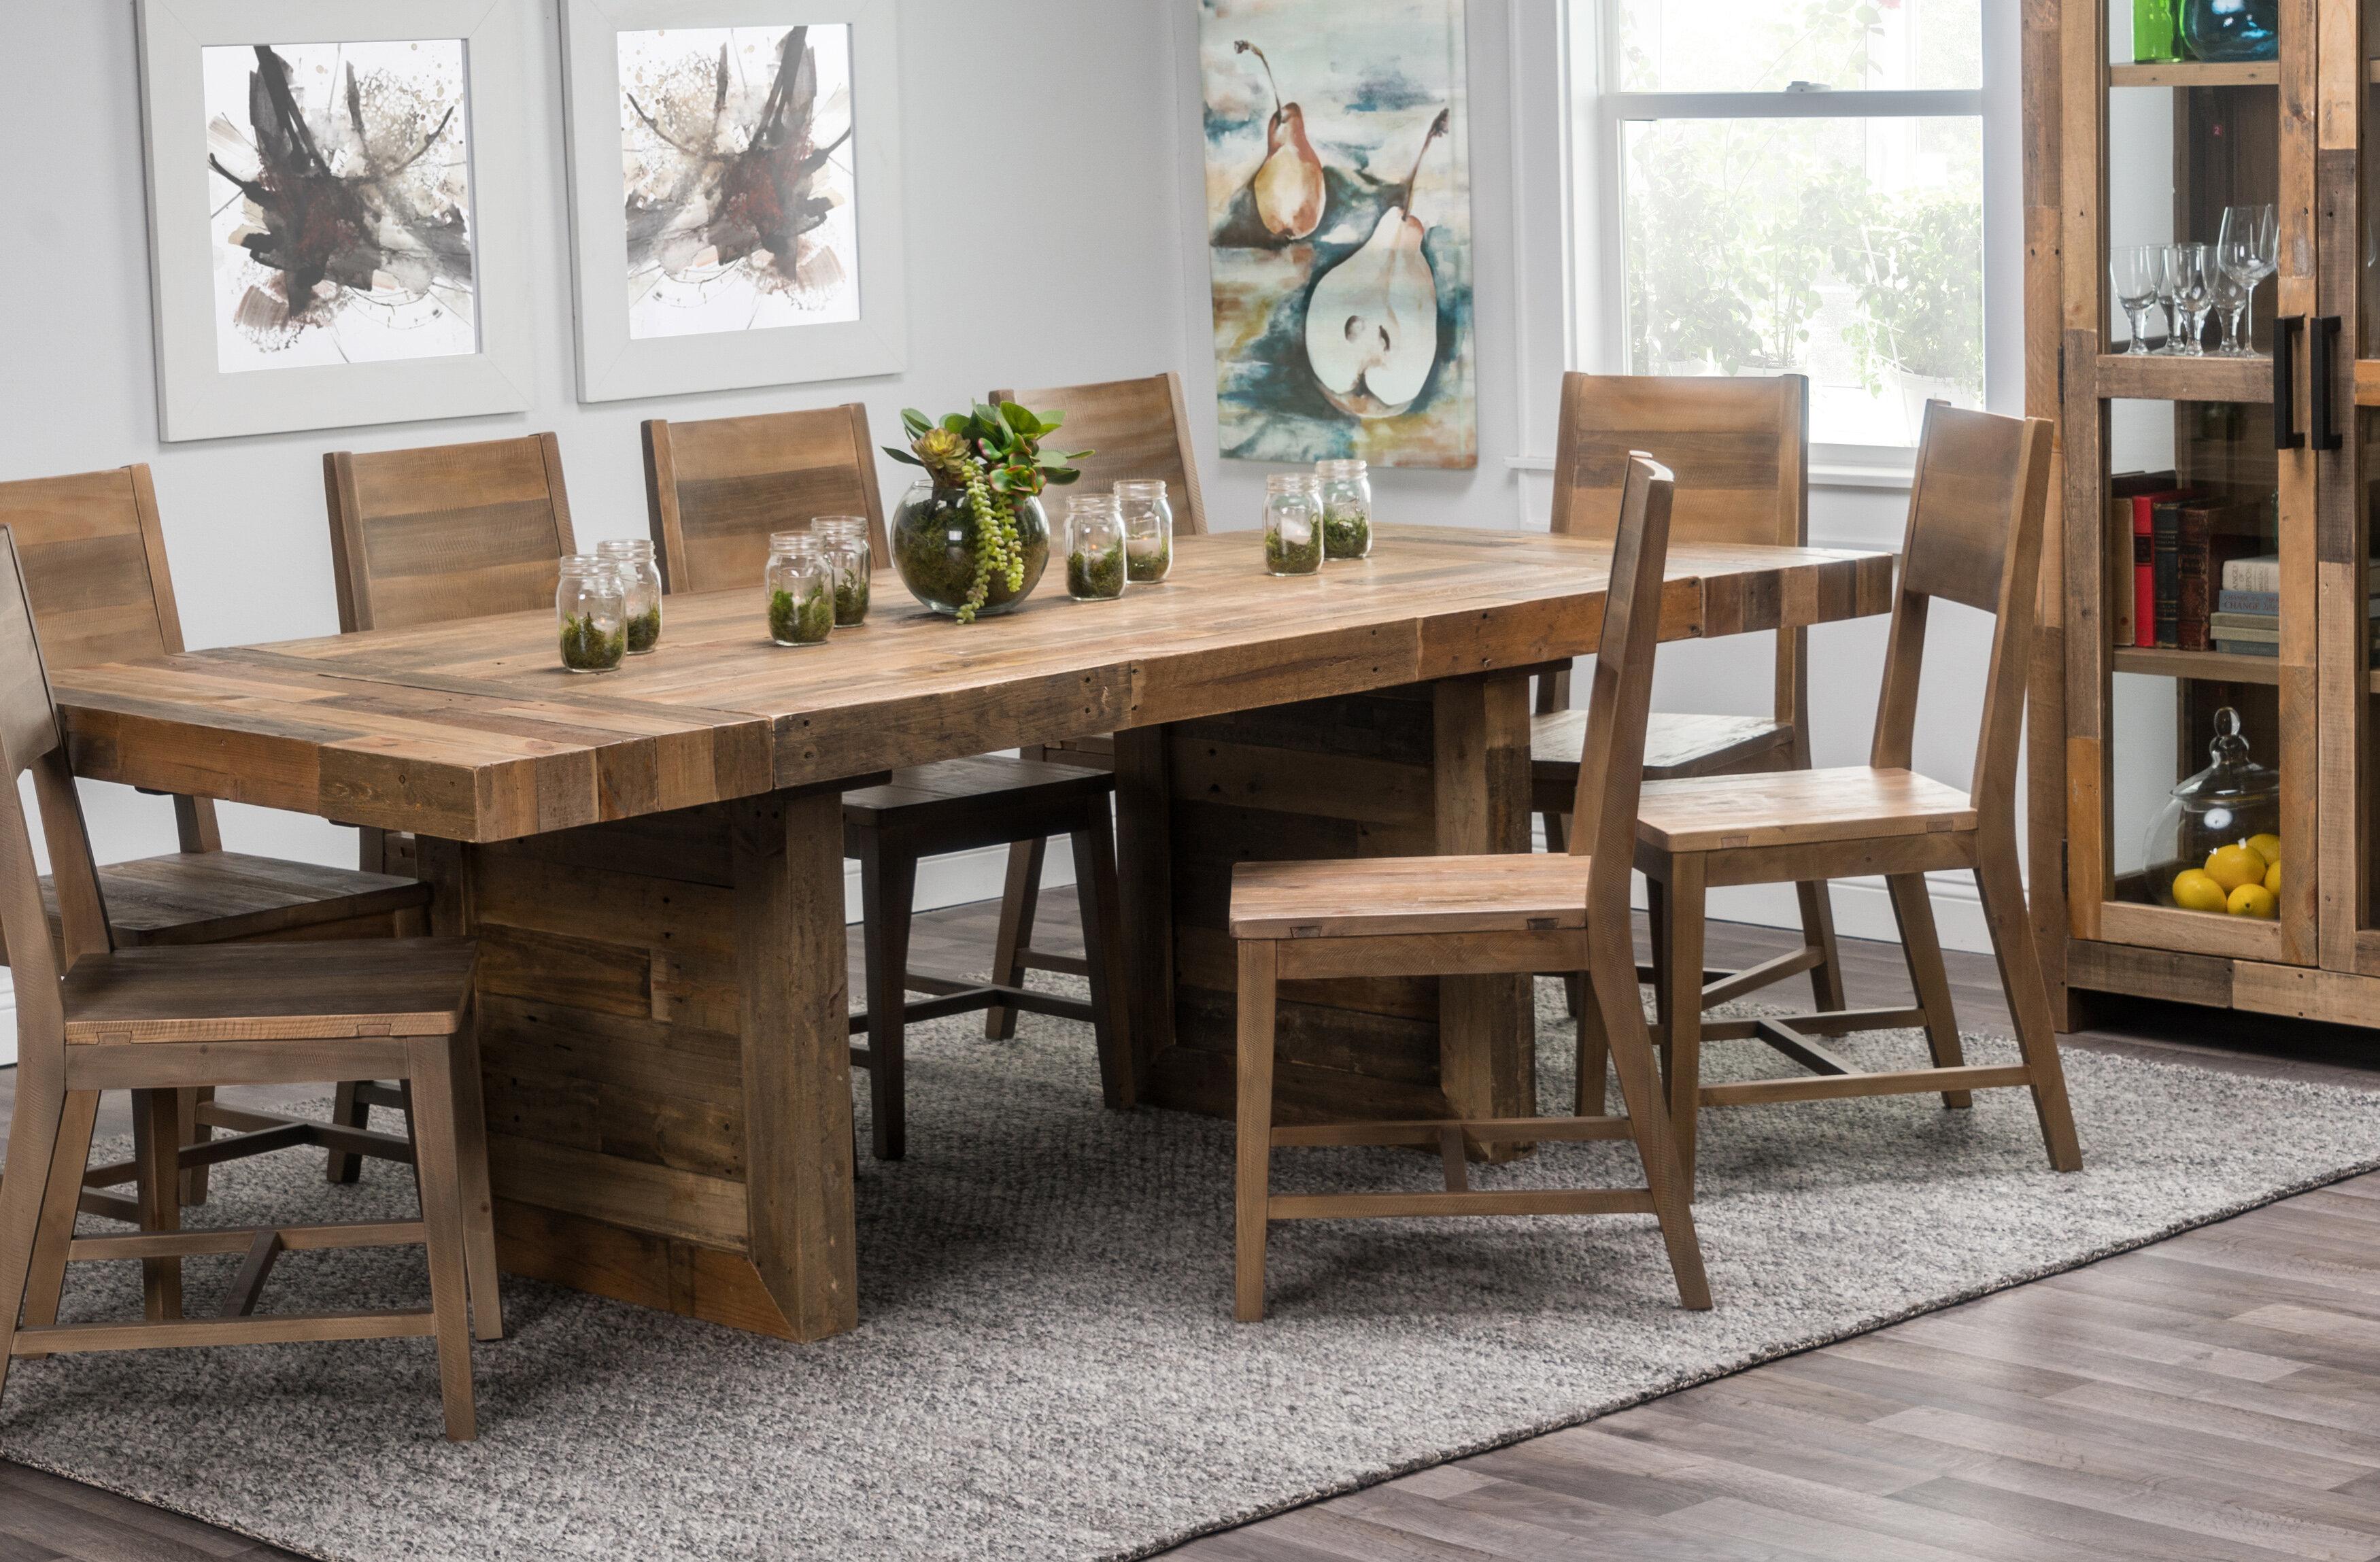 Birch Lane Fredricks Extendable Pine Solid Wood Trestle Dining Table Reviews Wayfair